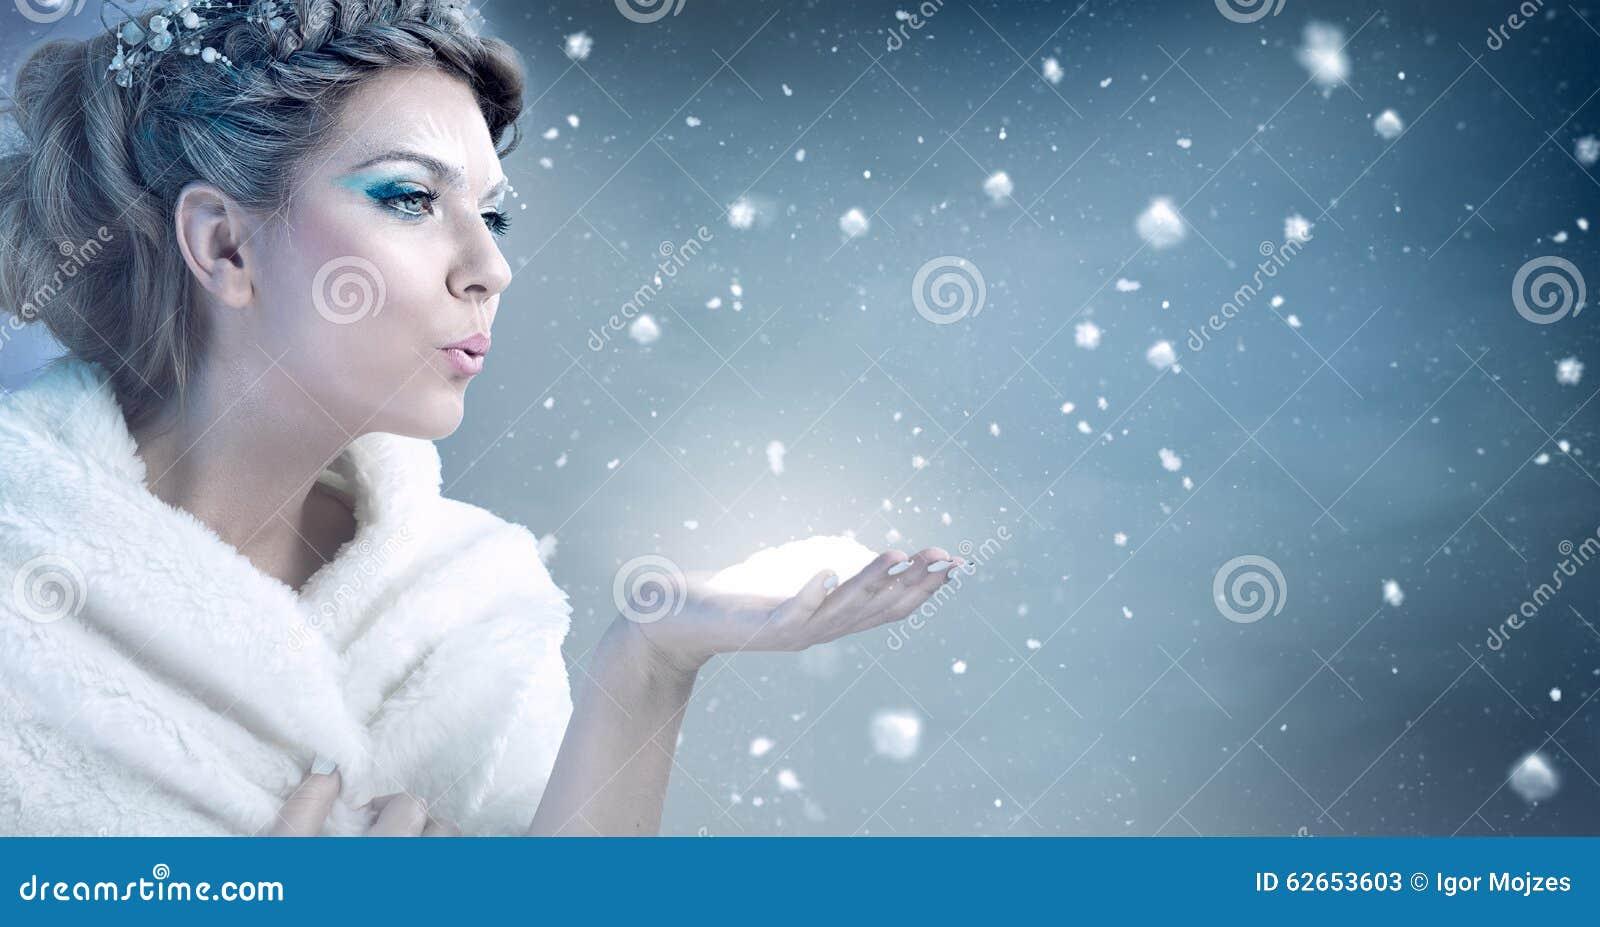 Winter woman blowing snow - snow queen